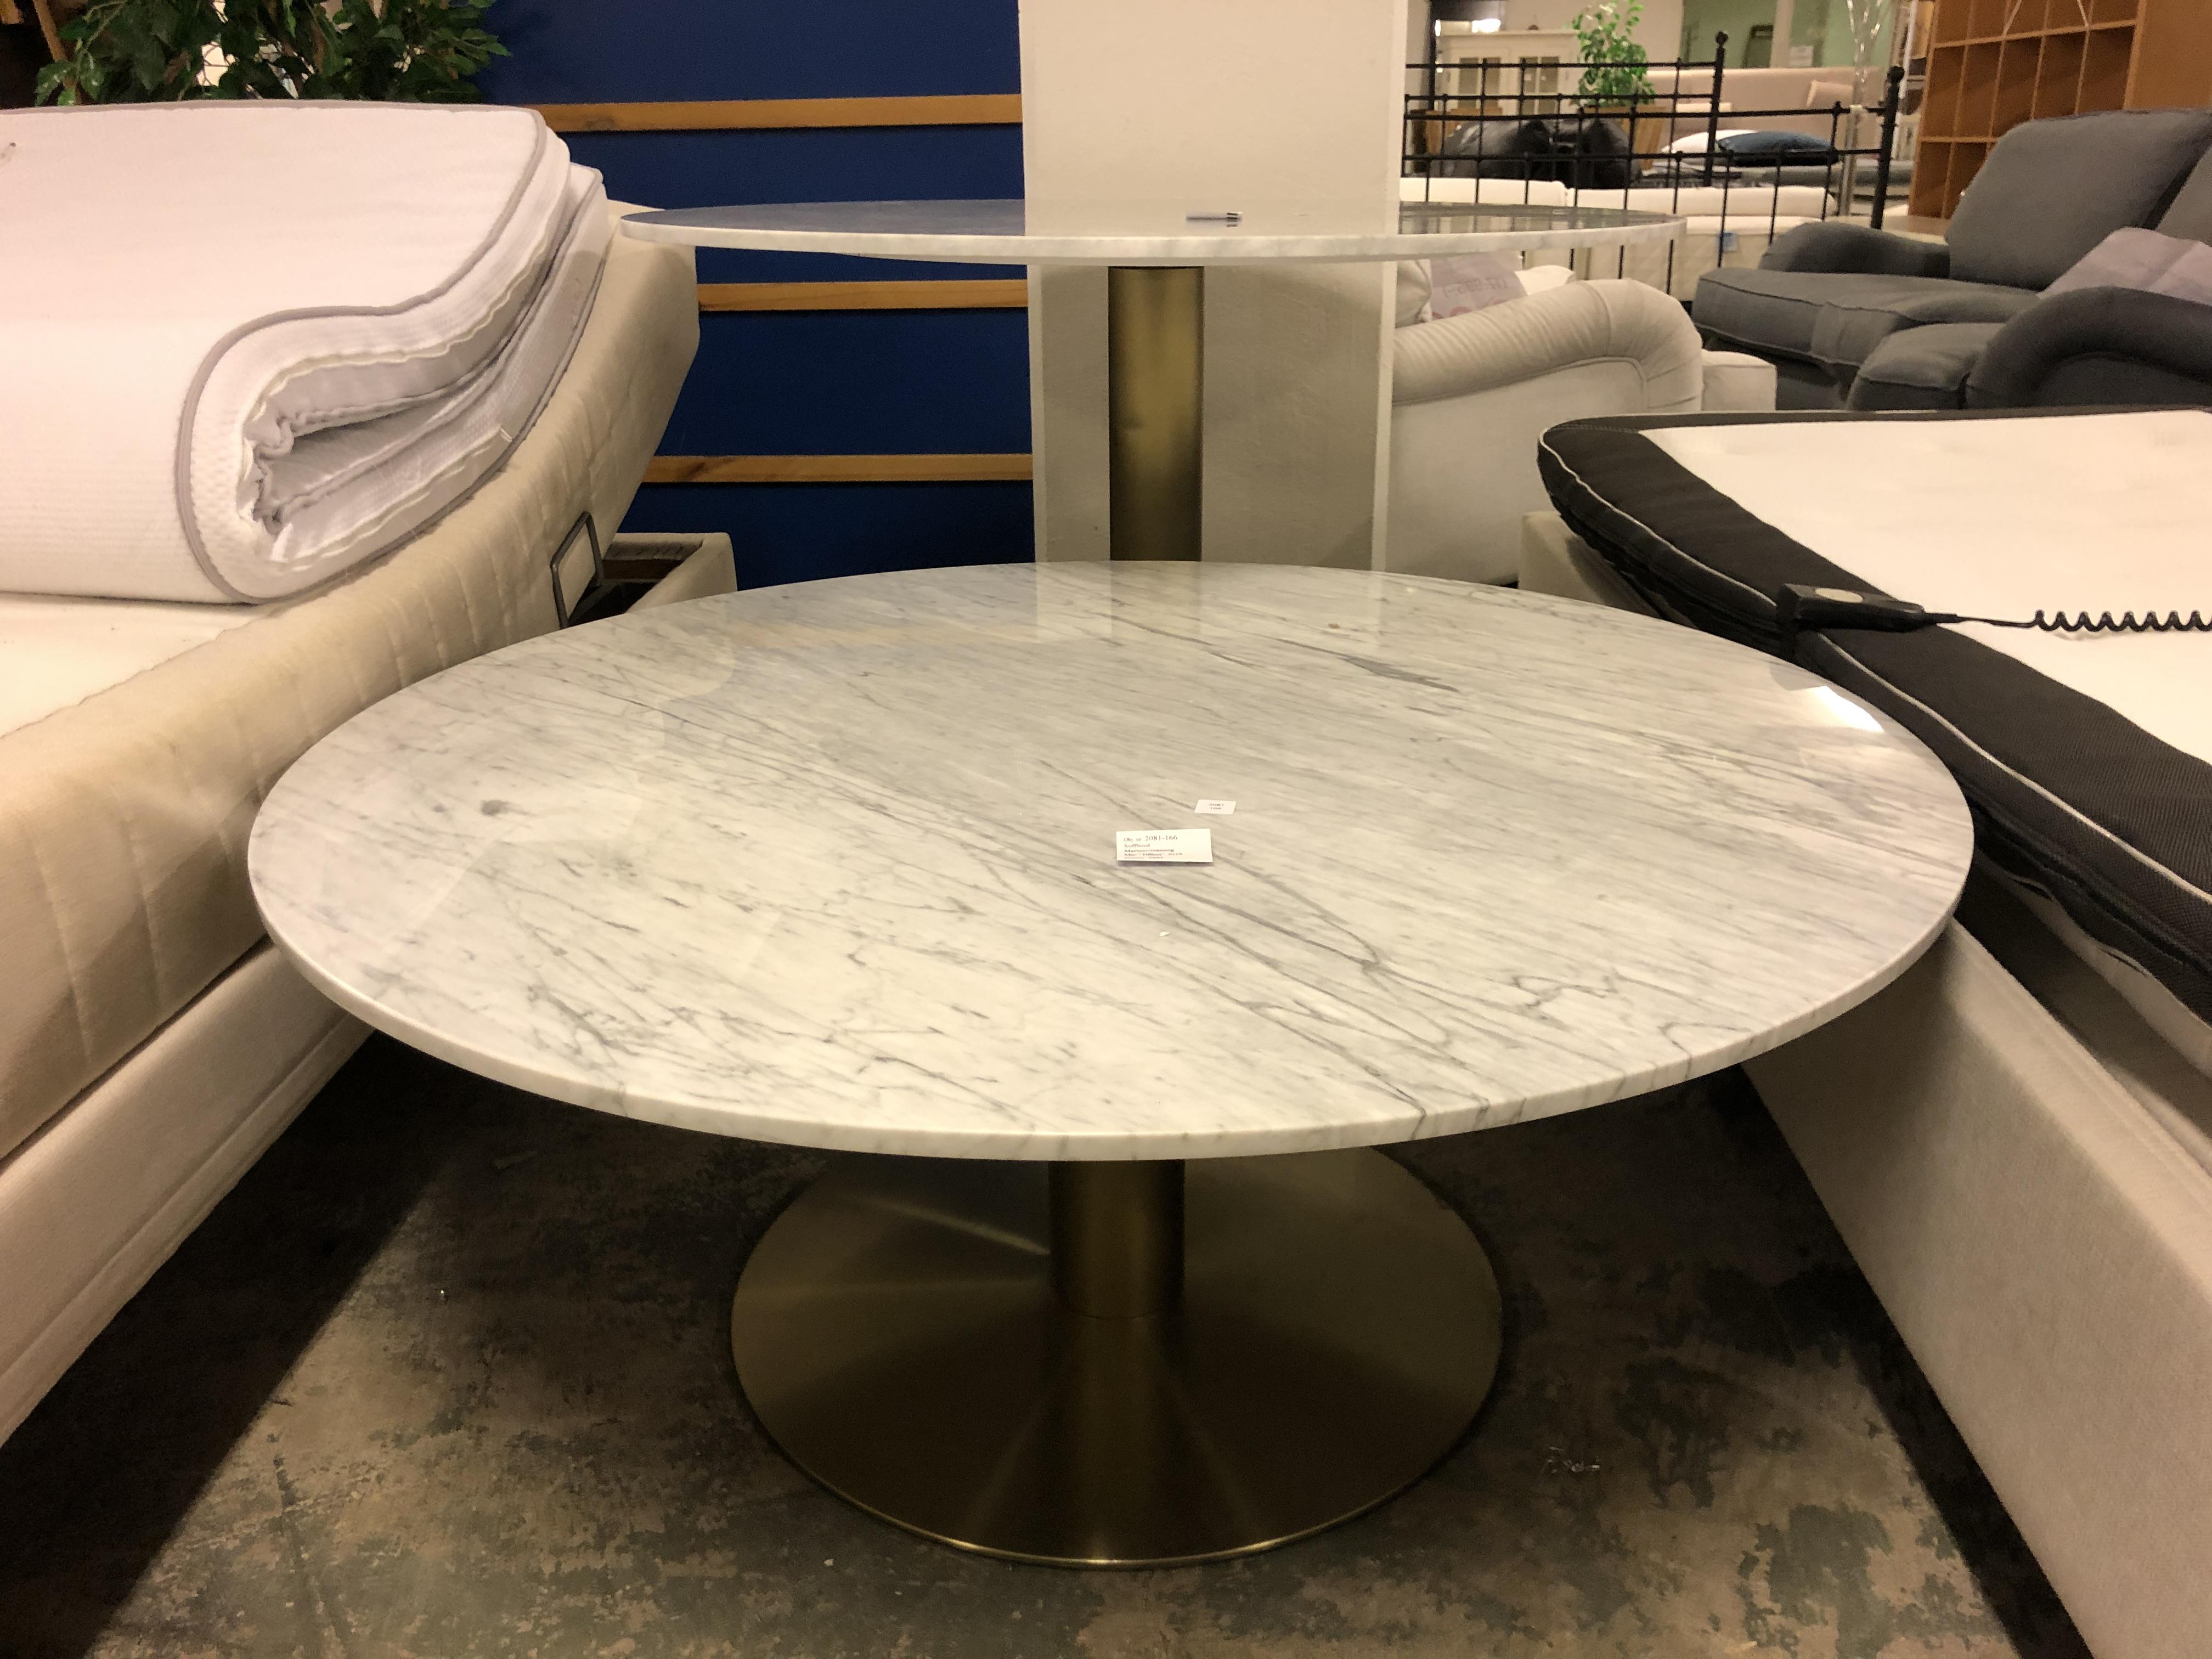 Mio Vardagsrumsbord Marmor